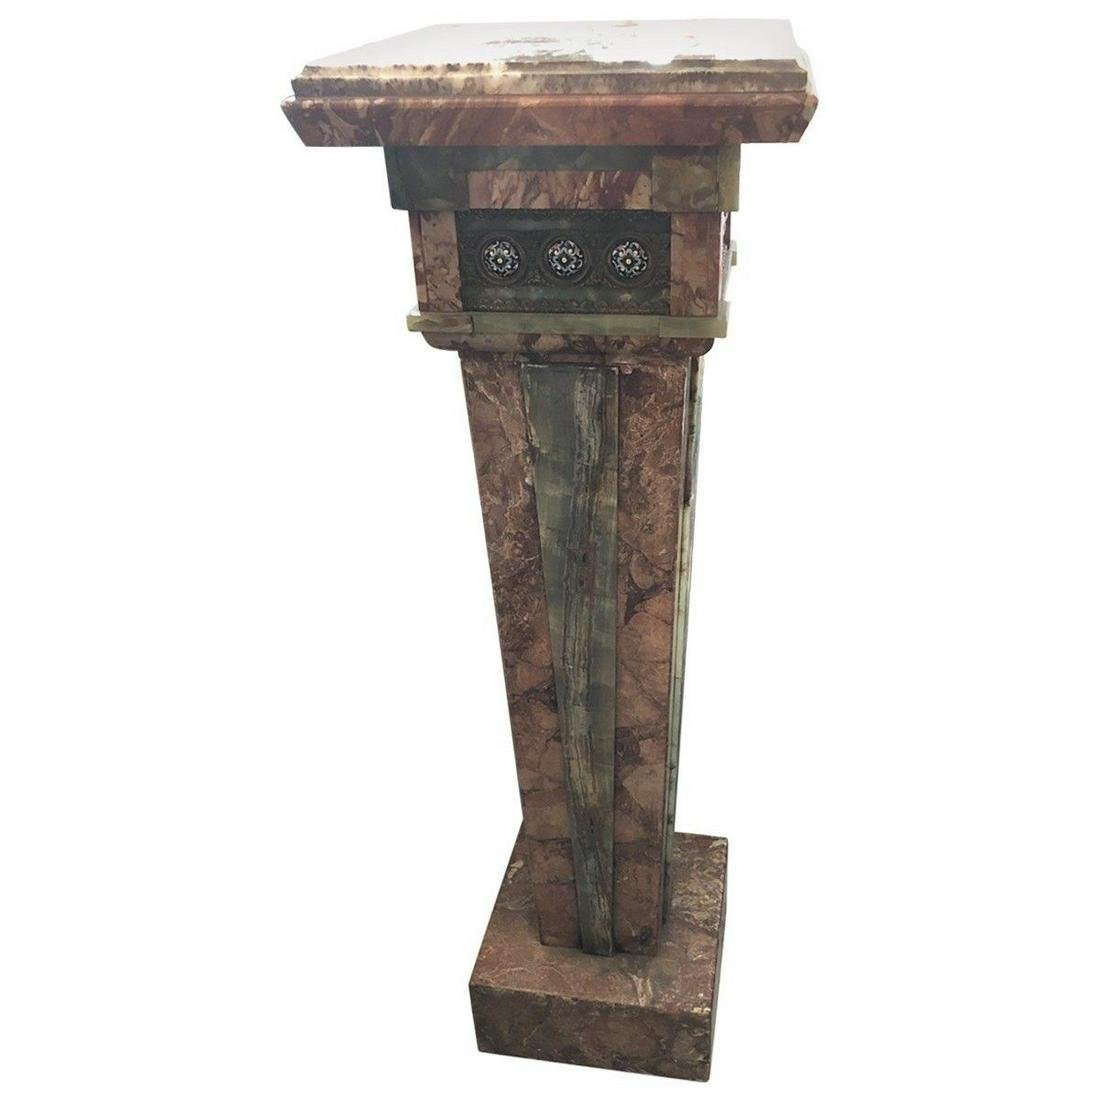 Aesthetic Movement Champlevé Enamel Inset Pedestal